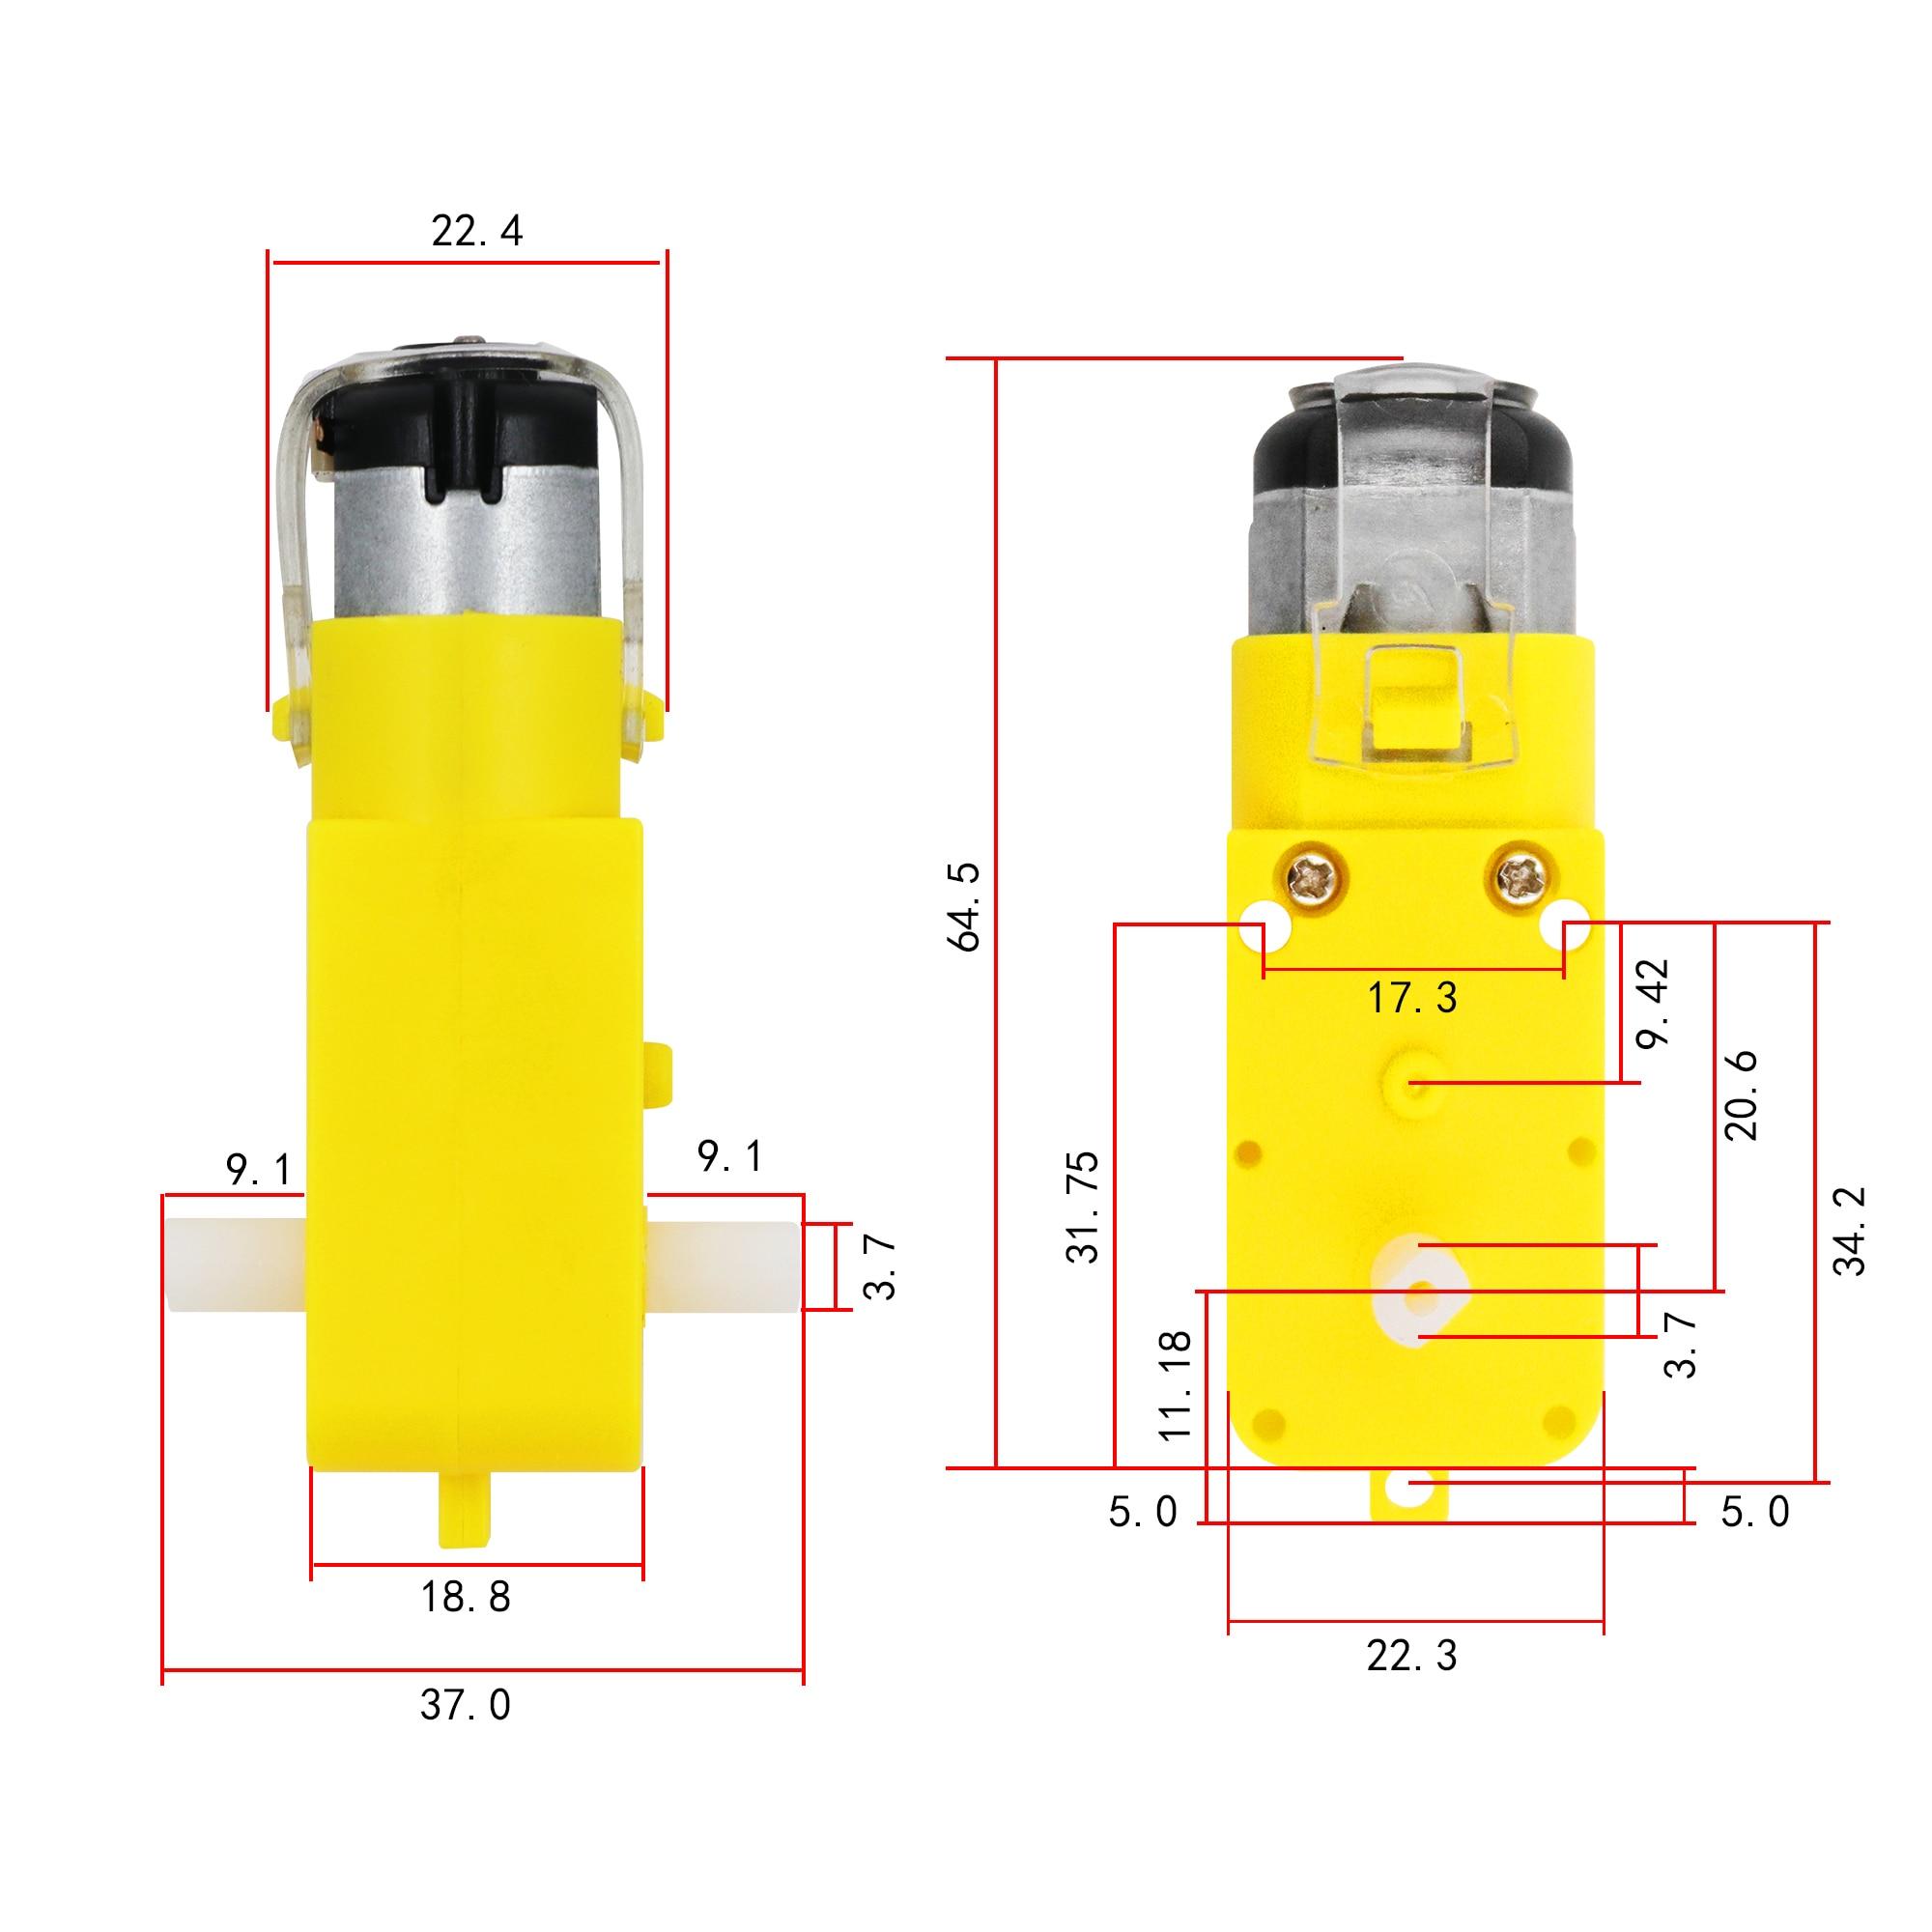 4 Piezas De Ruedas De Neum/áticos De Pl/ástico Para Arduino Robot Coche Inteligente Con Dc3v-6v Reductor De Engranajes De Motor 4pcs